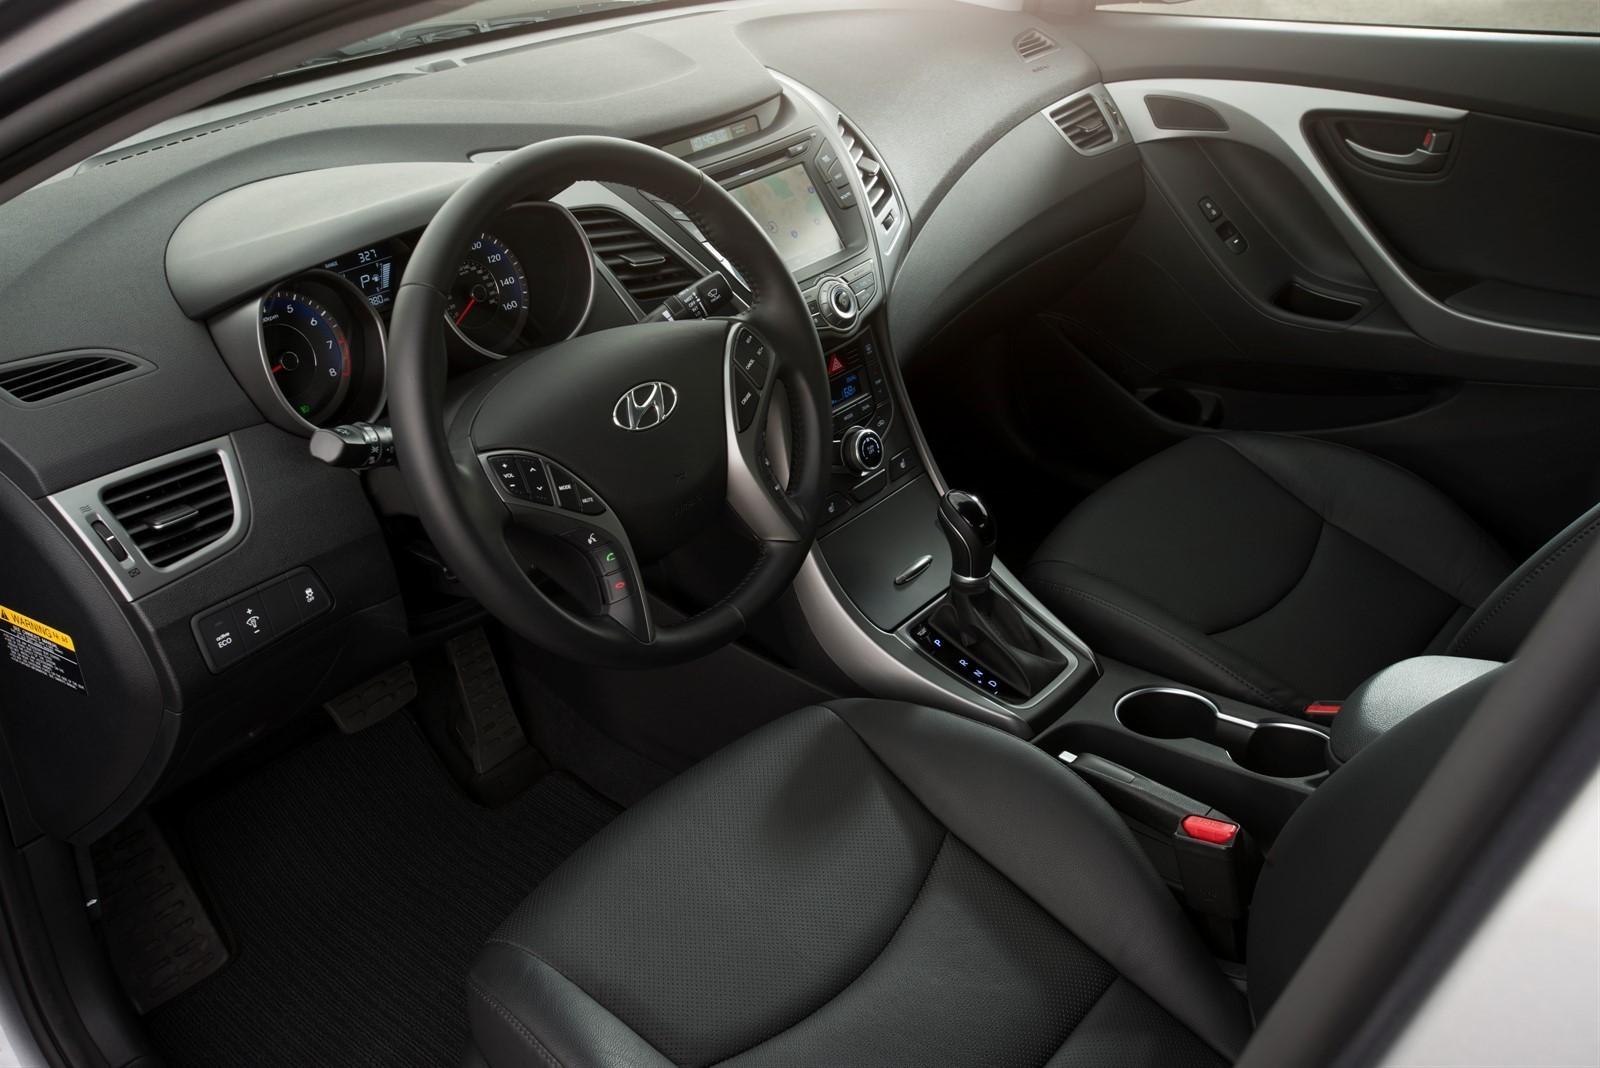 2015 Hyundai Elantra Announced Us India Car News